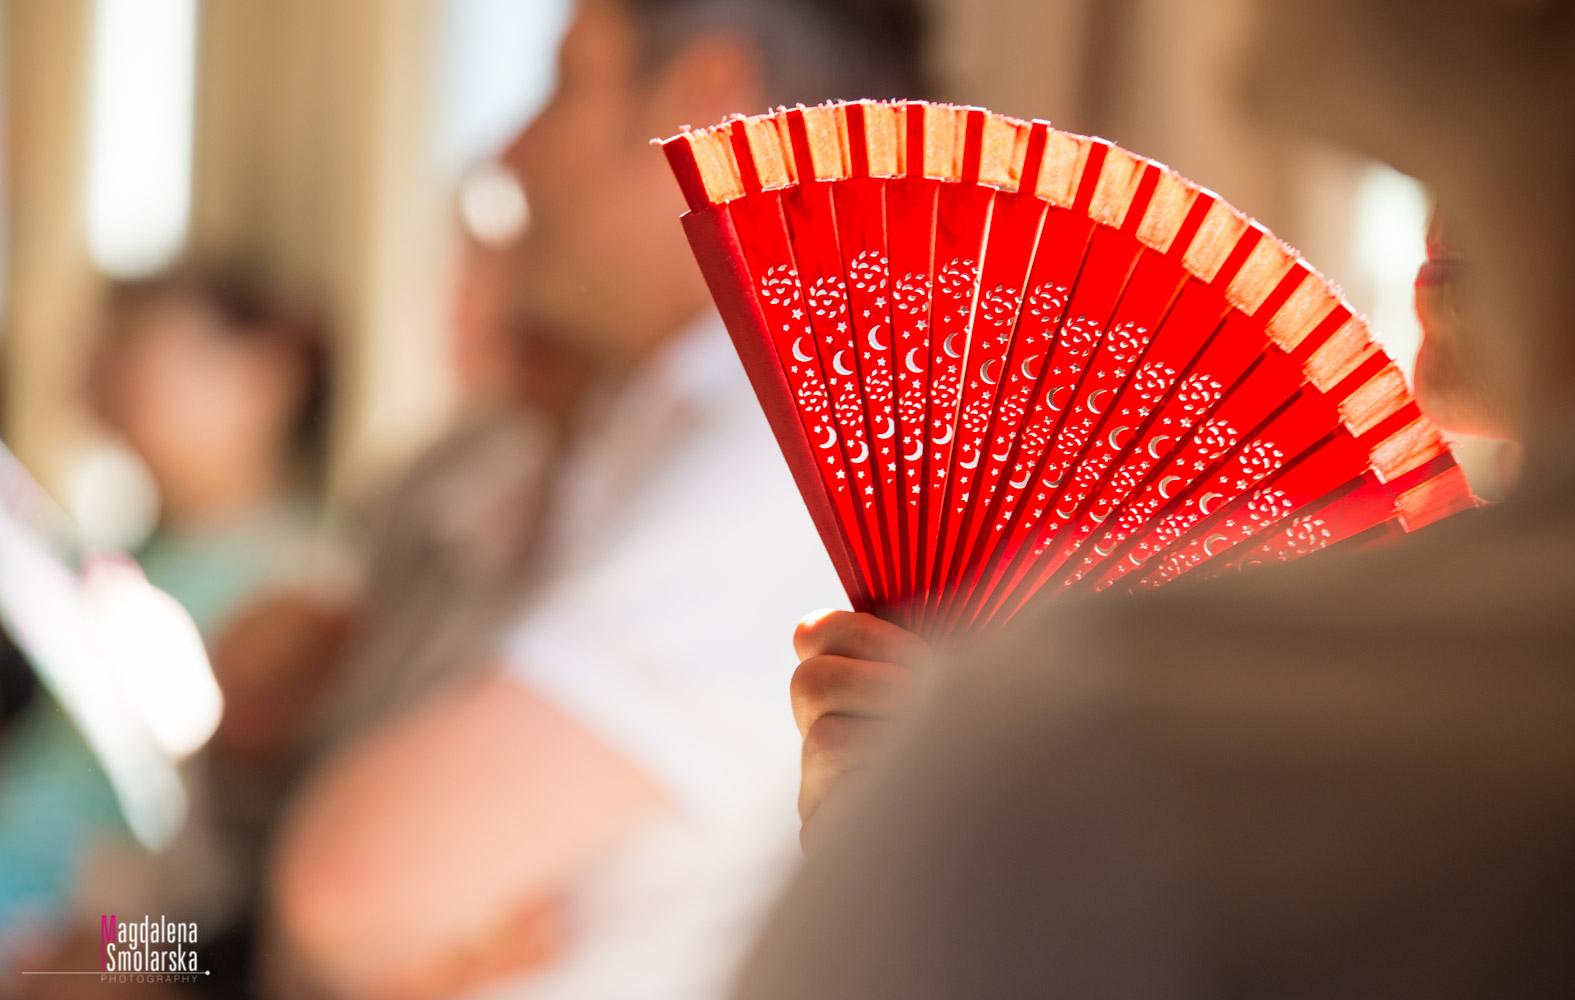 London & Brighton Portrait Photographer- Red Tango fan and beautiful light